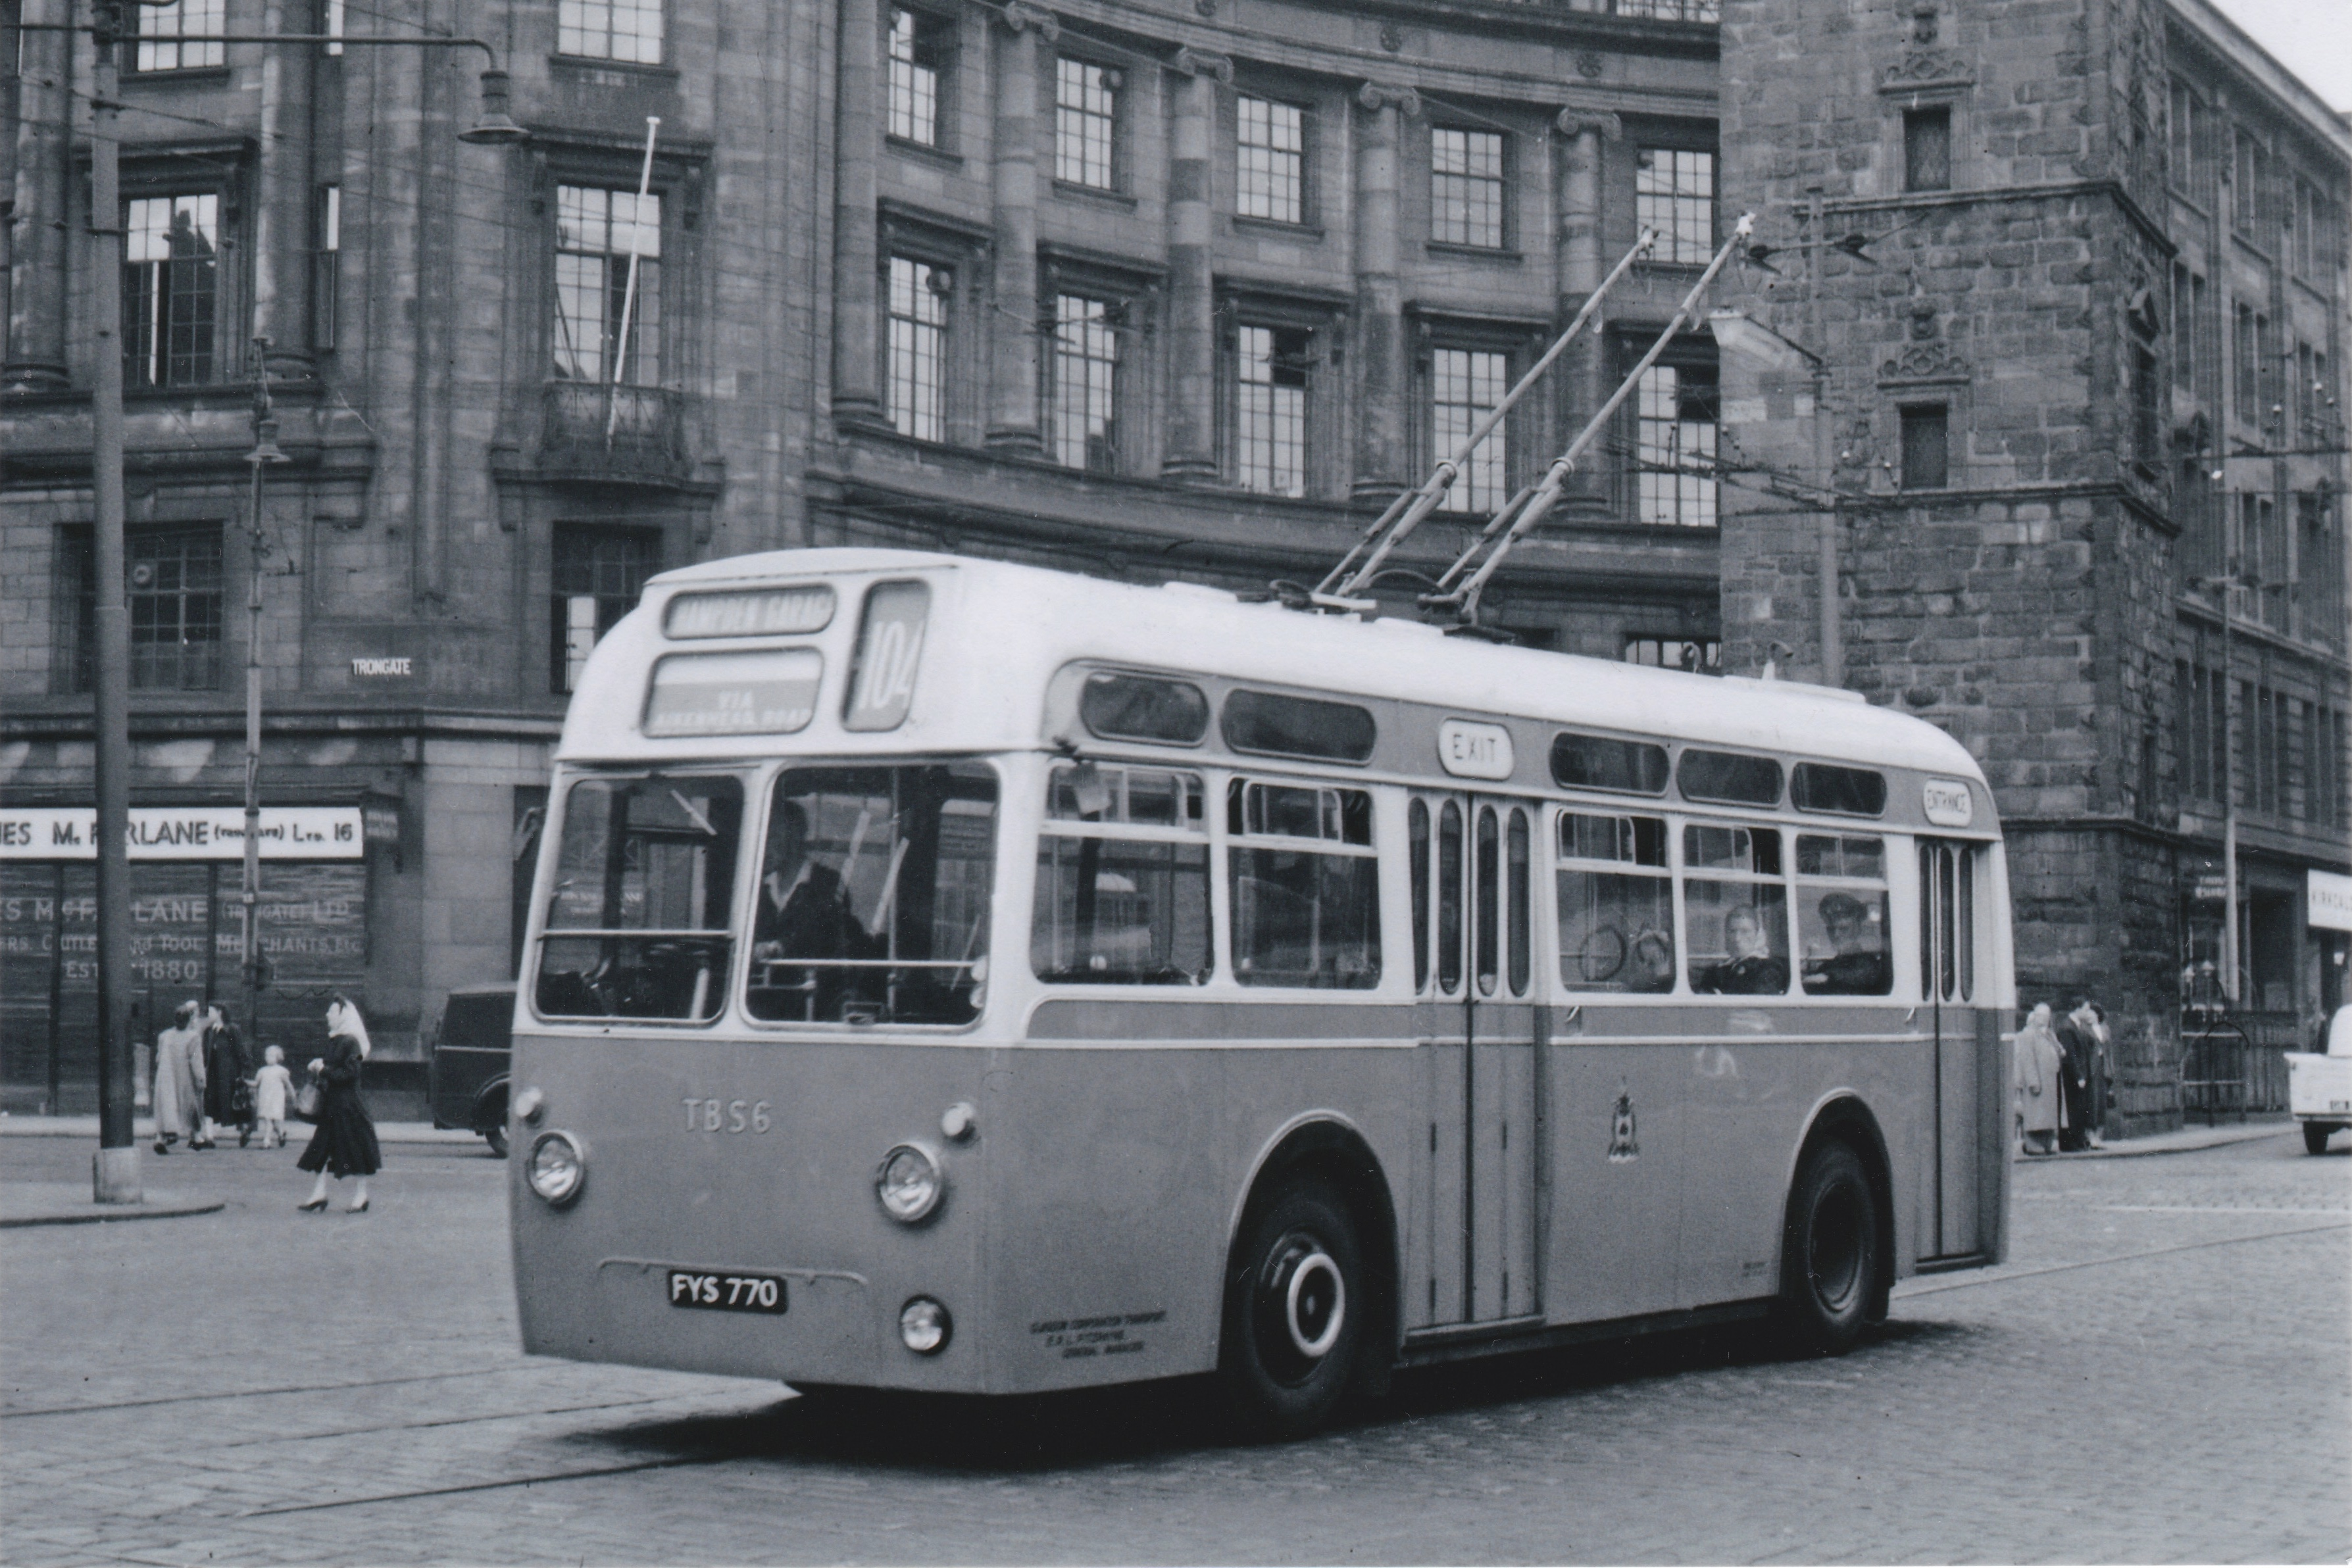 Glasgow's Trolleybuses